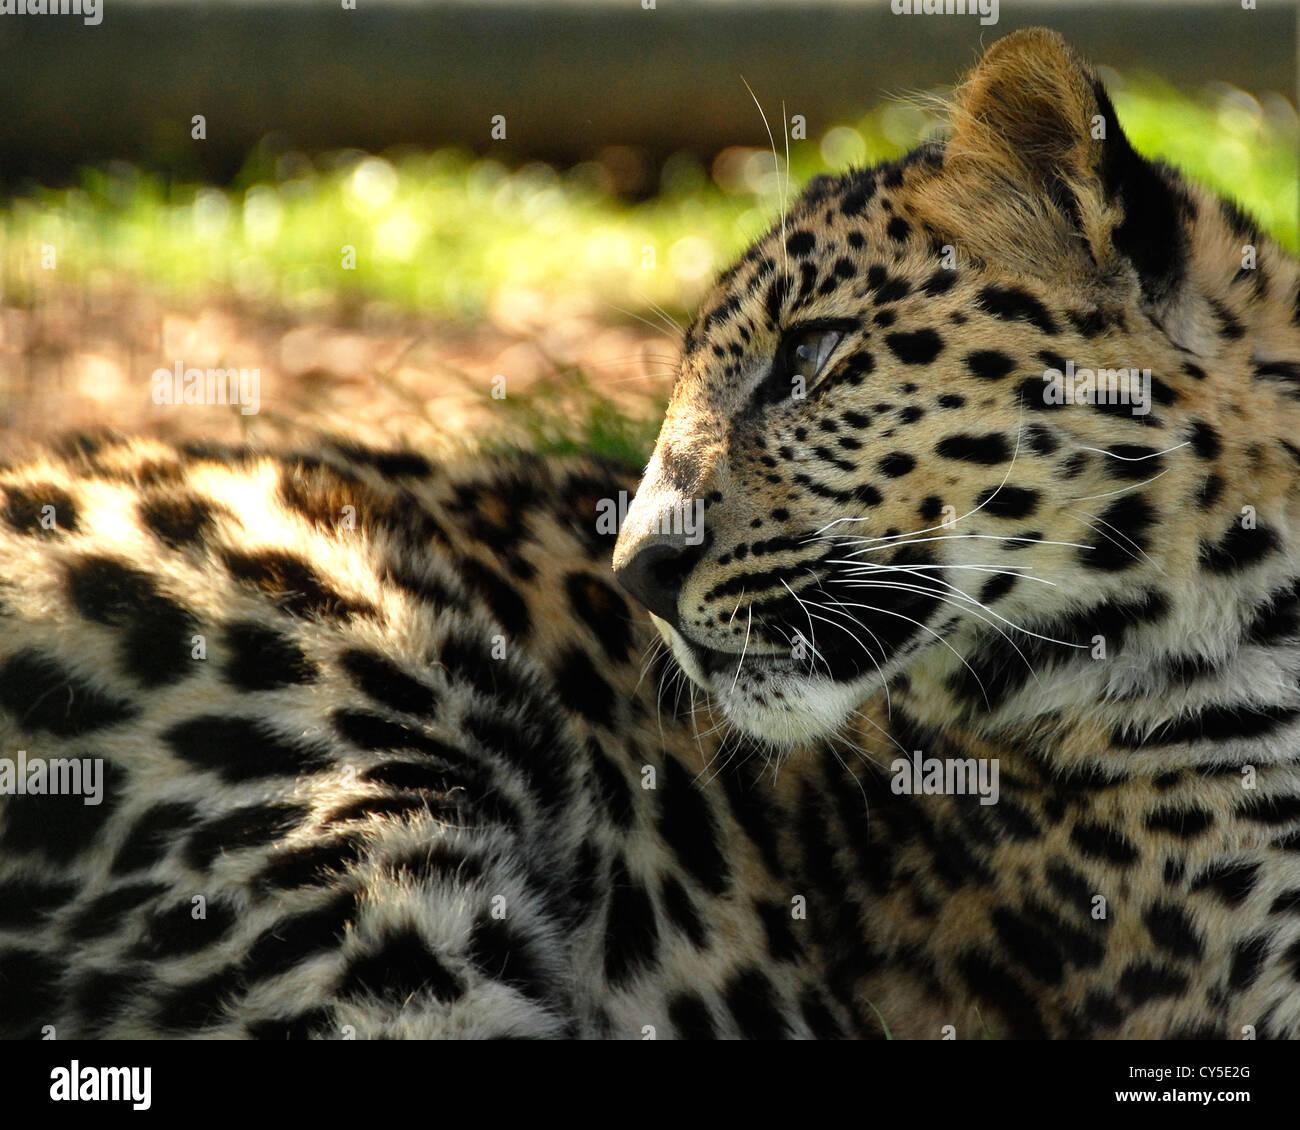 Closeup of Amur Leopard lying down - Stock Image